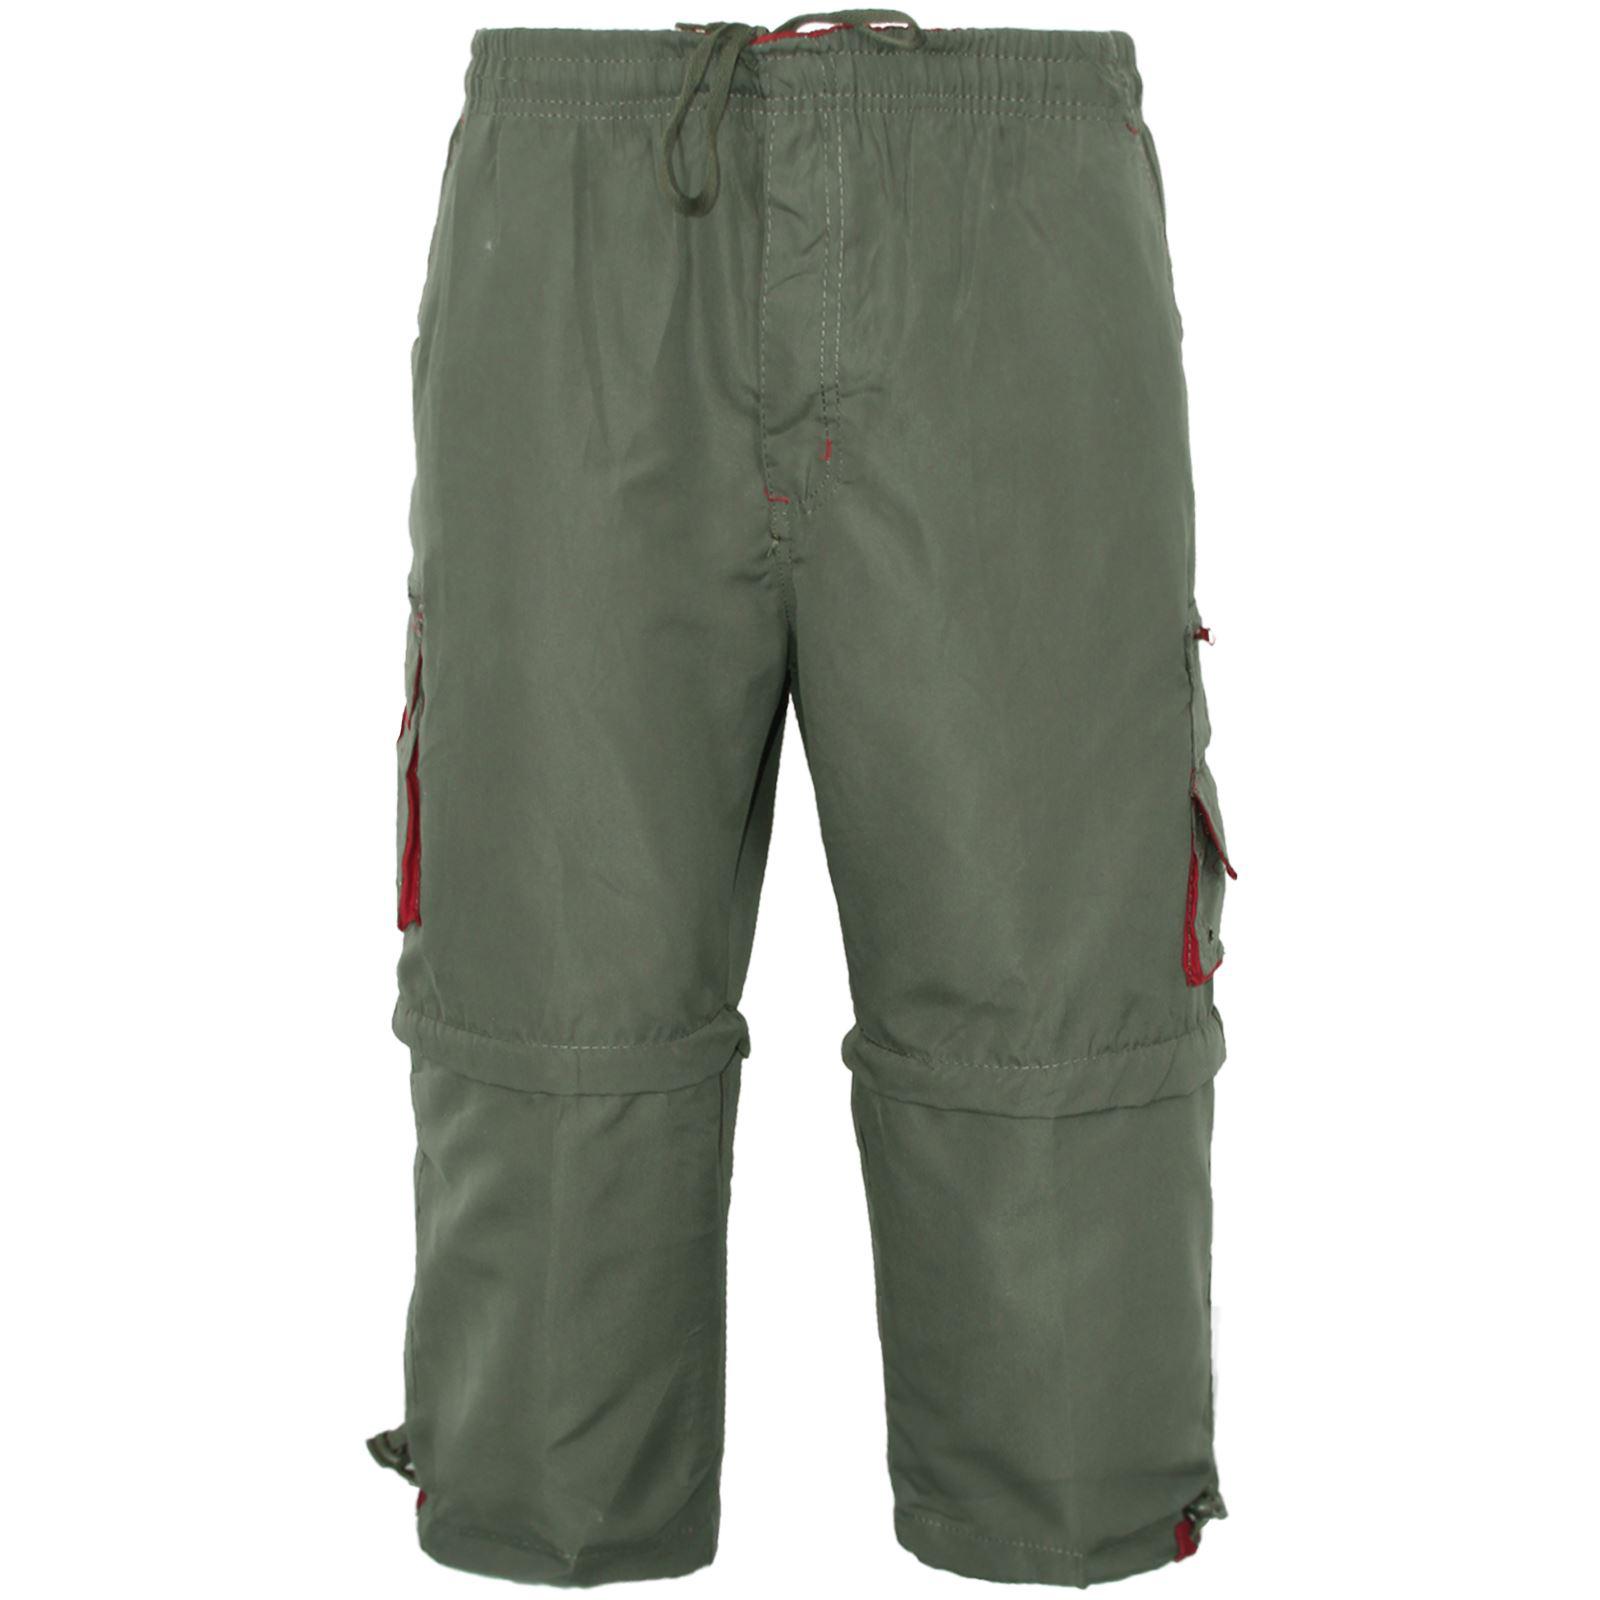 Symbol Of The Brand Ladies 3/4 Trousers Womens Three Quarter Elasticated Waist Capri Cropped Pants Garter Belts